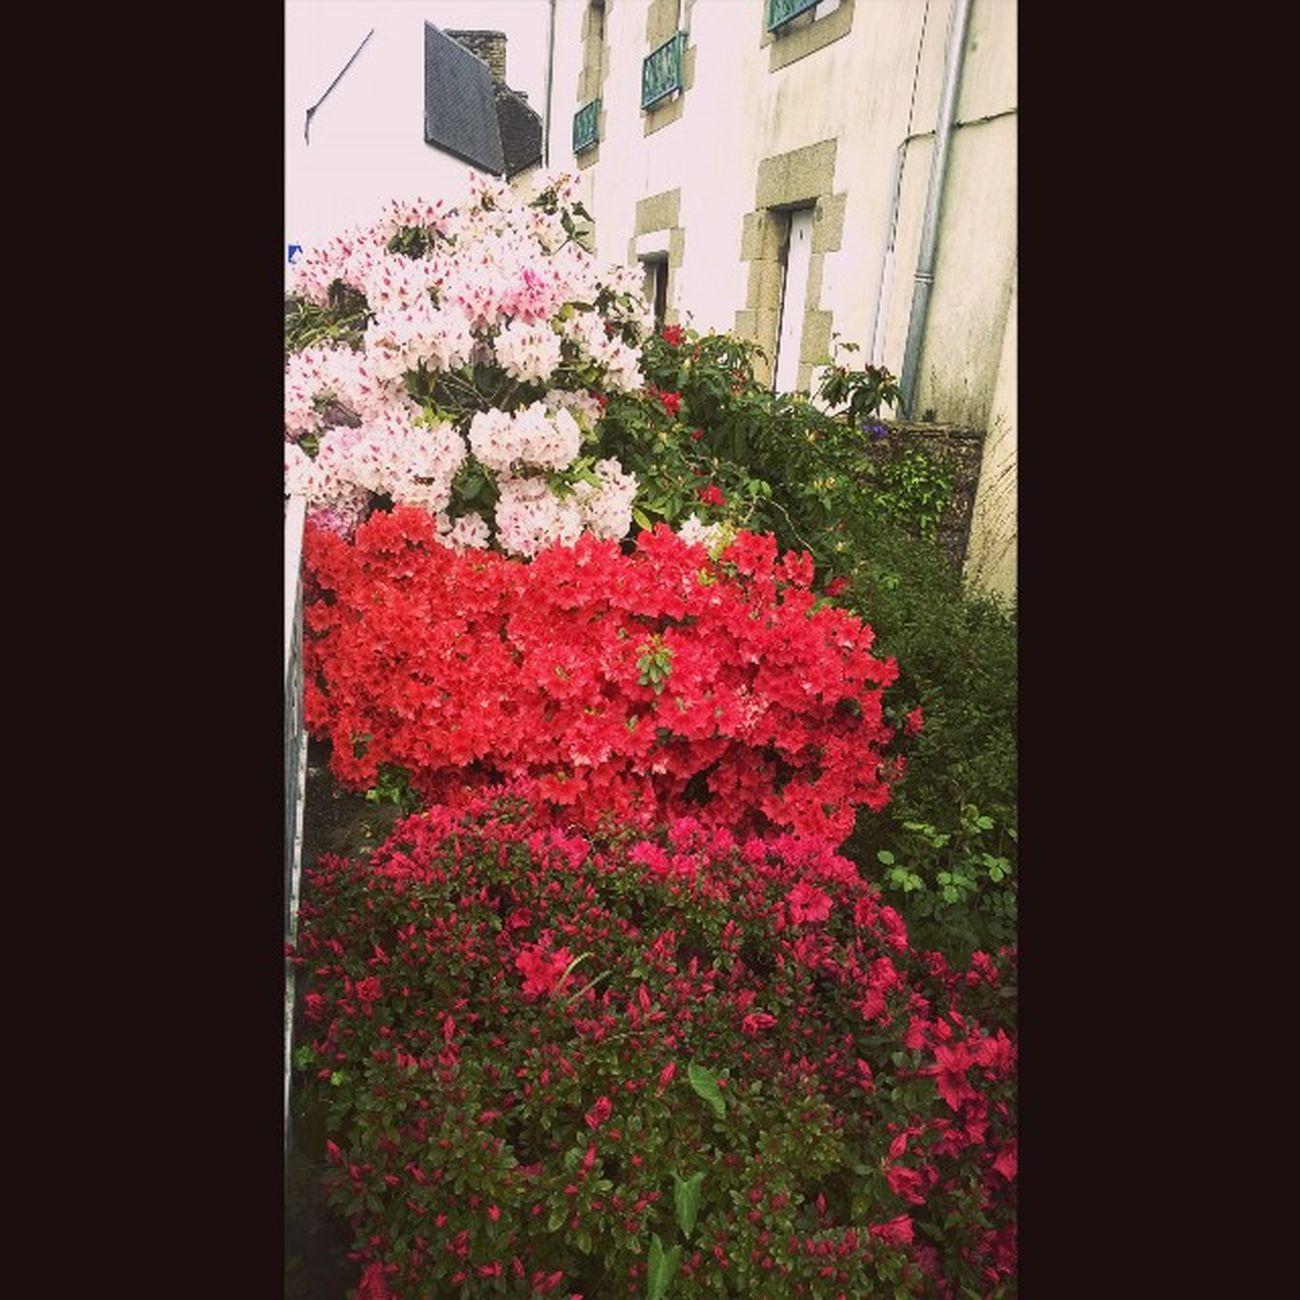 Les Fleurs du Cure de Taupont The Flowers of Taupont's Abbot Bretagne Breizh Jaimelabretagne Fansdebretagne Morbihan Miamorbihan Nature Natura Flowergram Fleursgram Instagram Instaflower